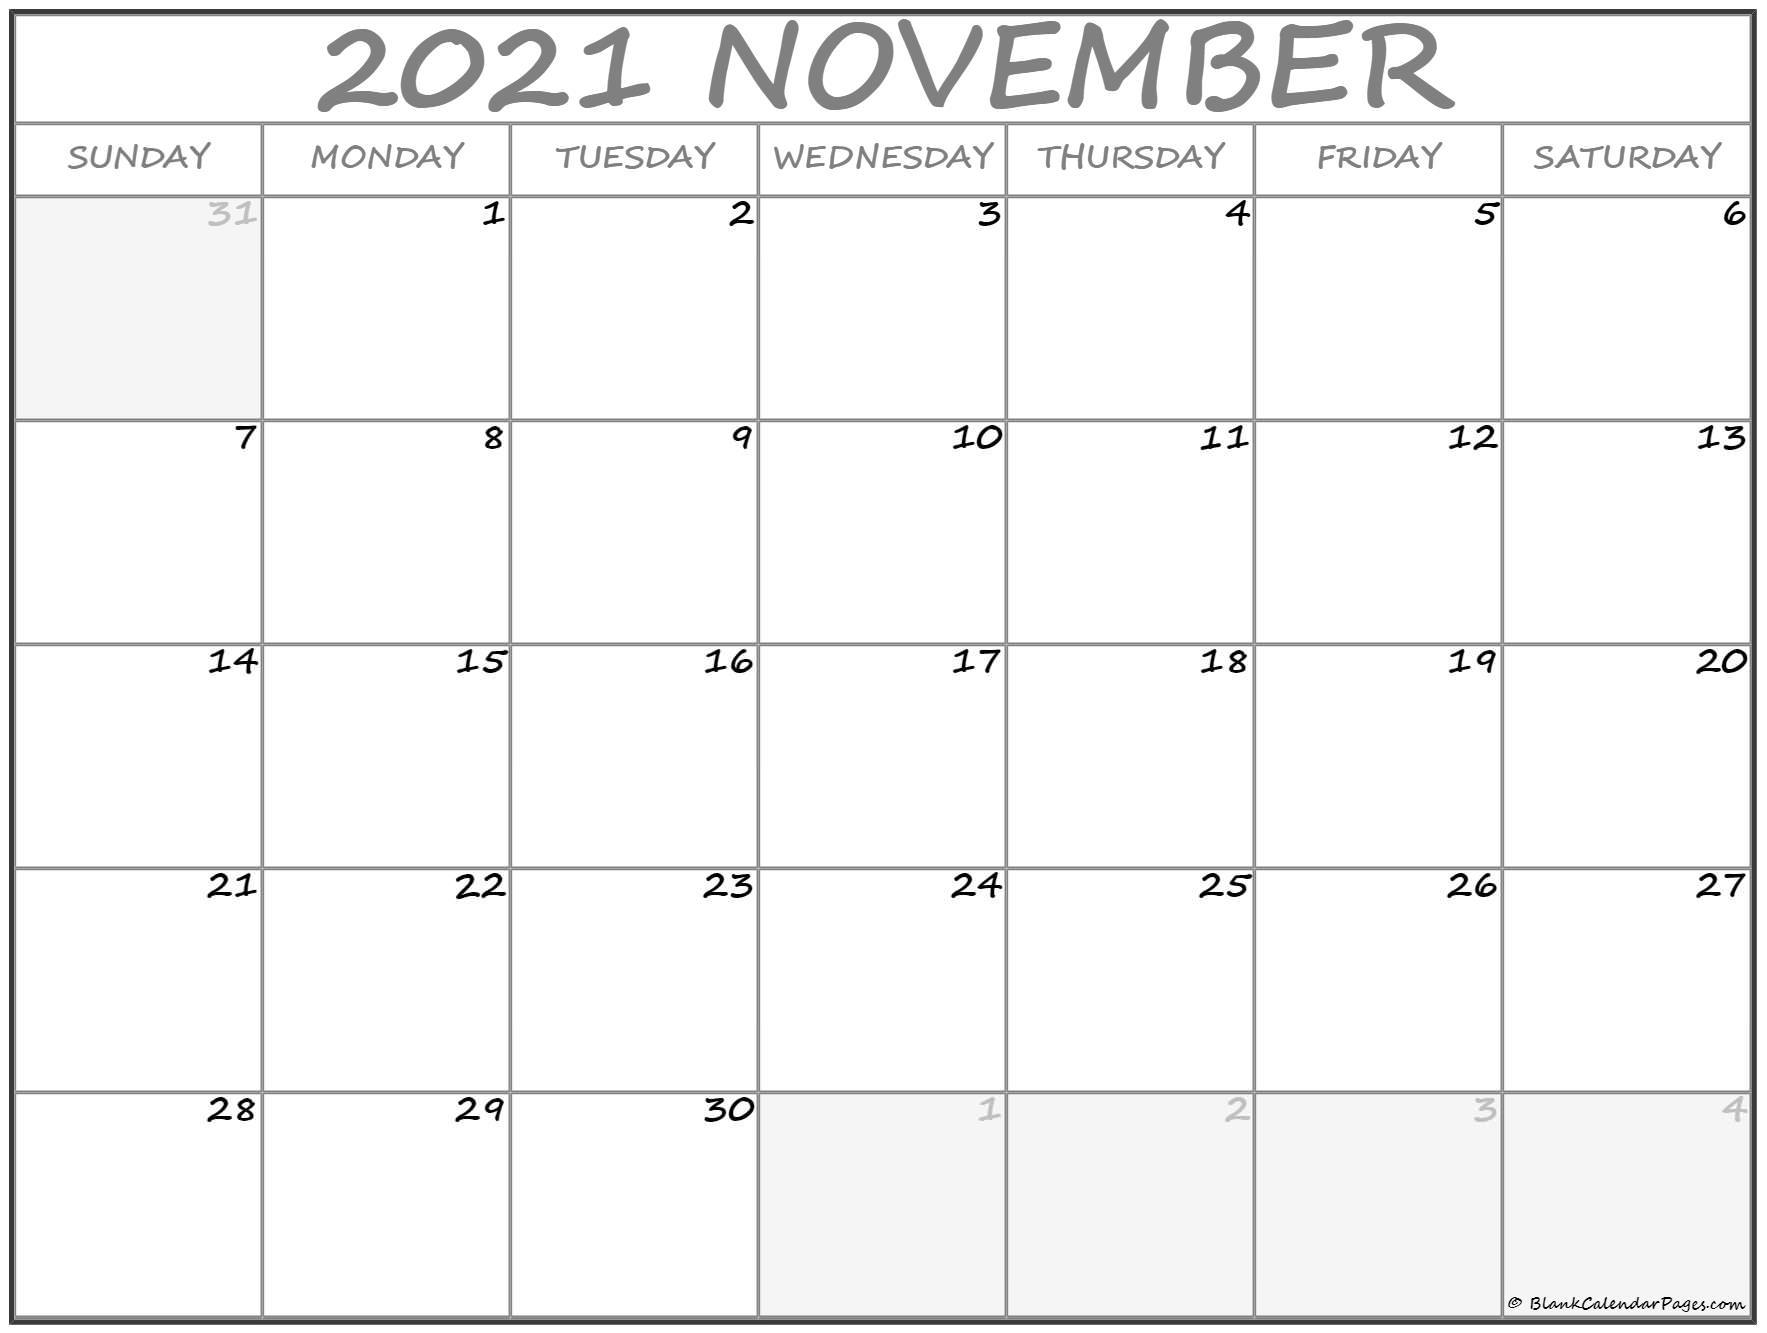 November 2021 Calendar Free Printable Monthly Calendars 1